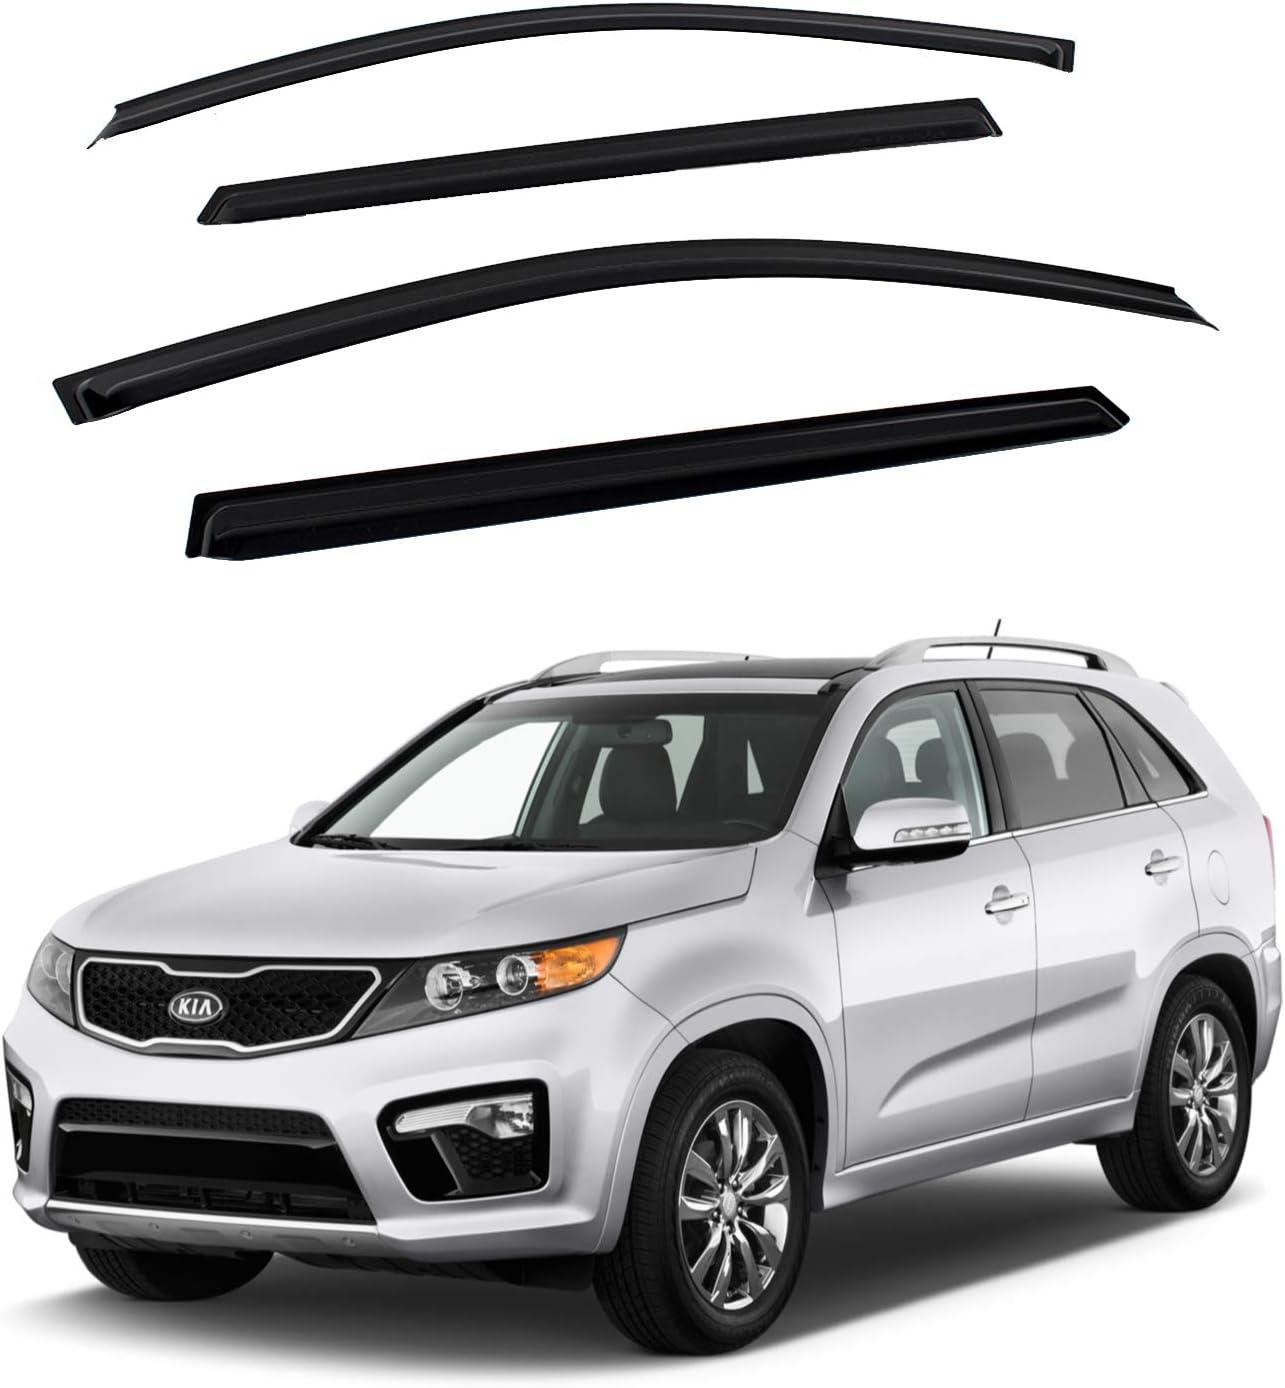 4PCS For 2011-2015 Kia Sorento Sun//Rain Guard Vent Shade Window Visors Deflector